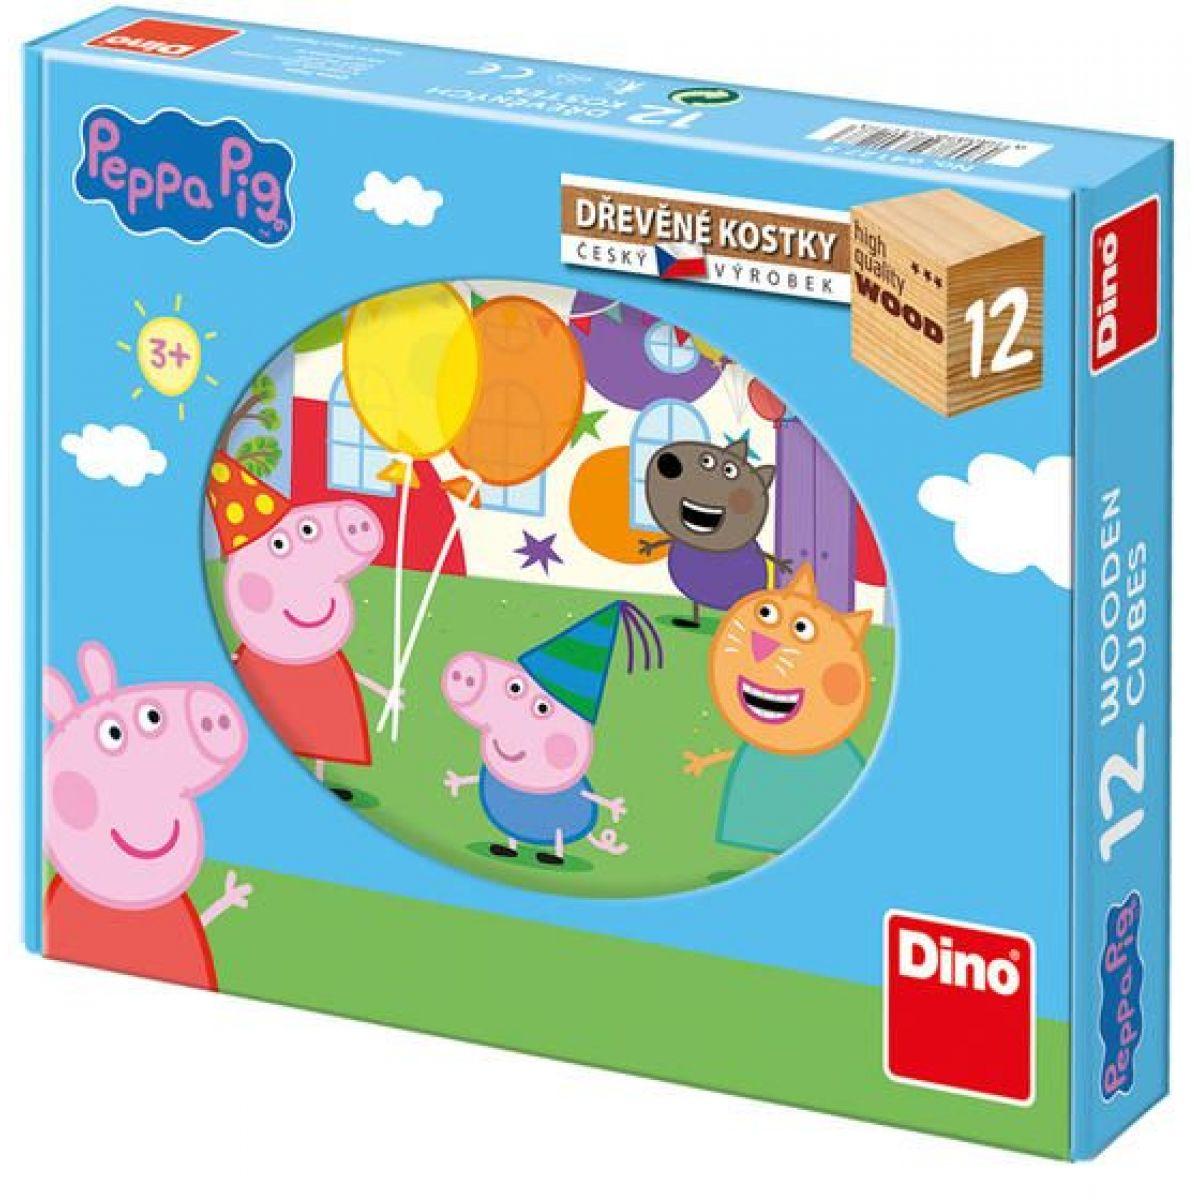 Dino dřevěné kostky Peppa Pig 12 kostek